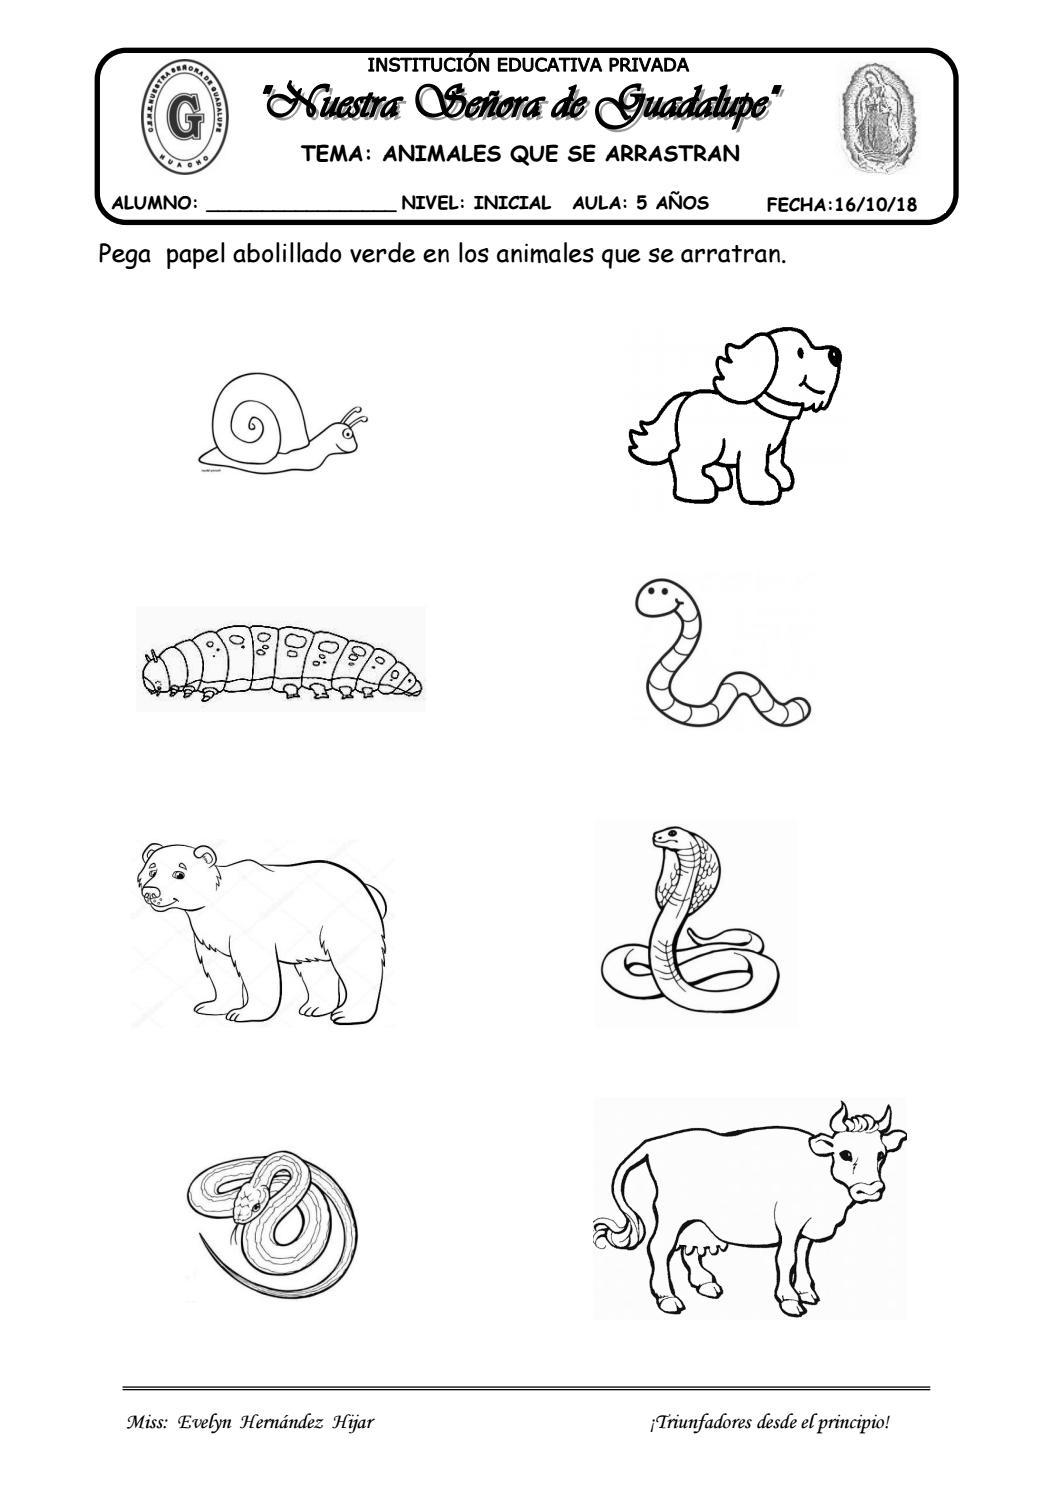 Tema Animales Que Se Arrastran By Evelynabejitas Issuu